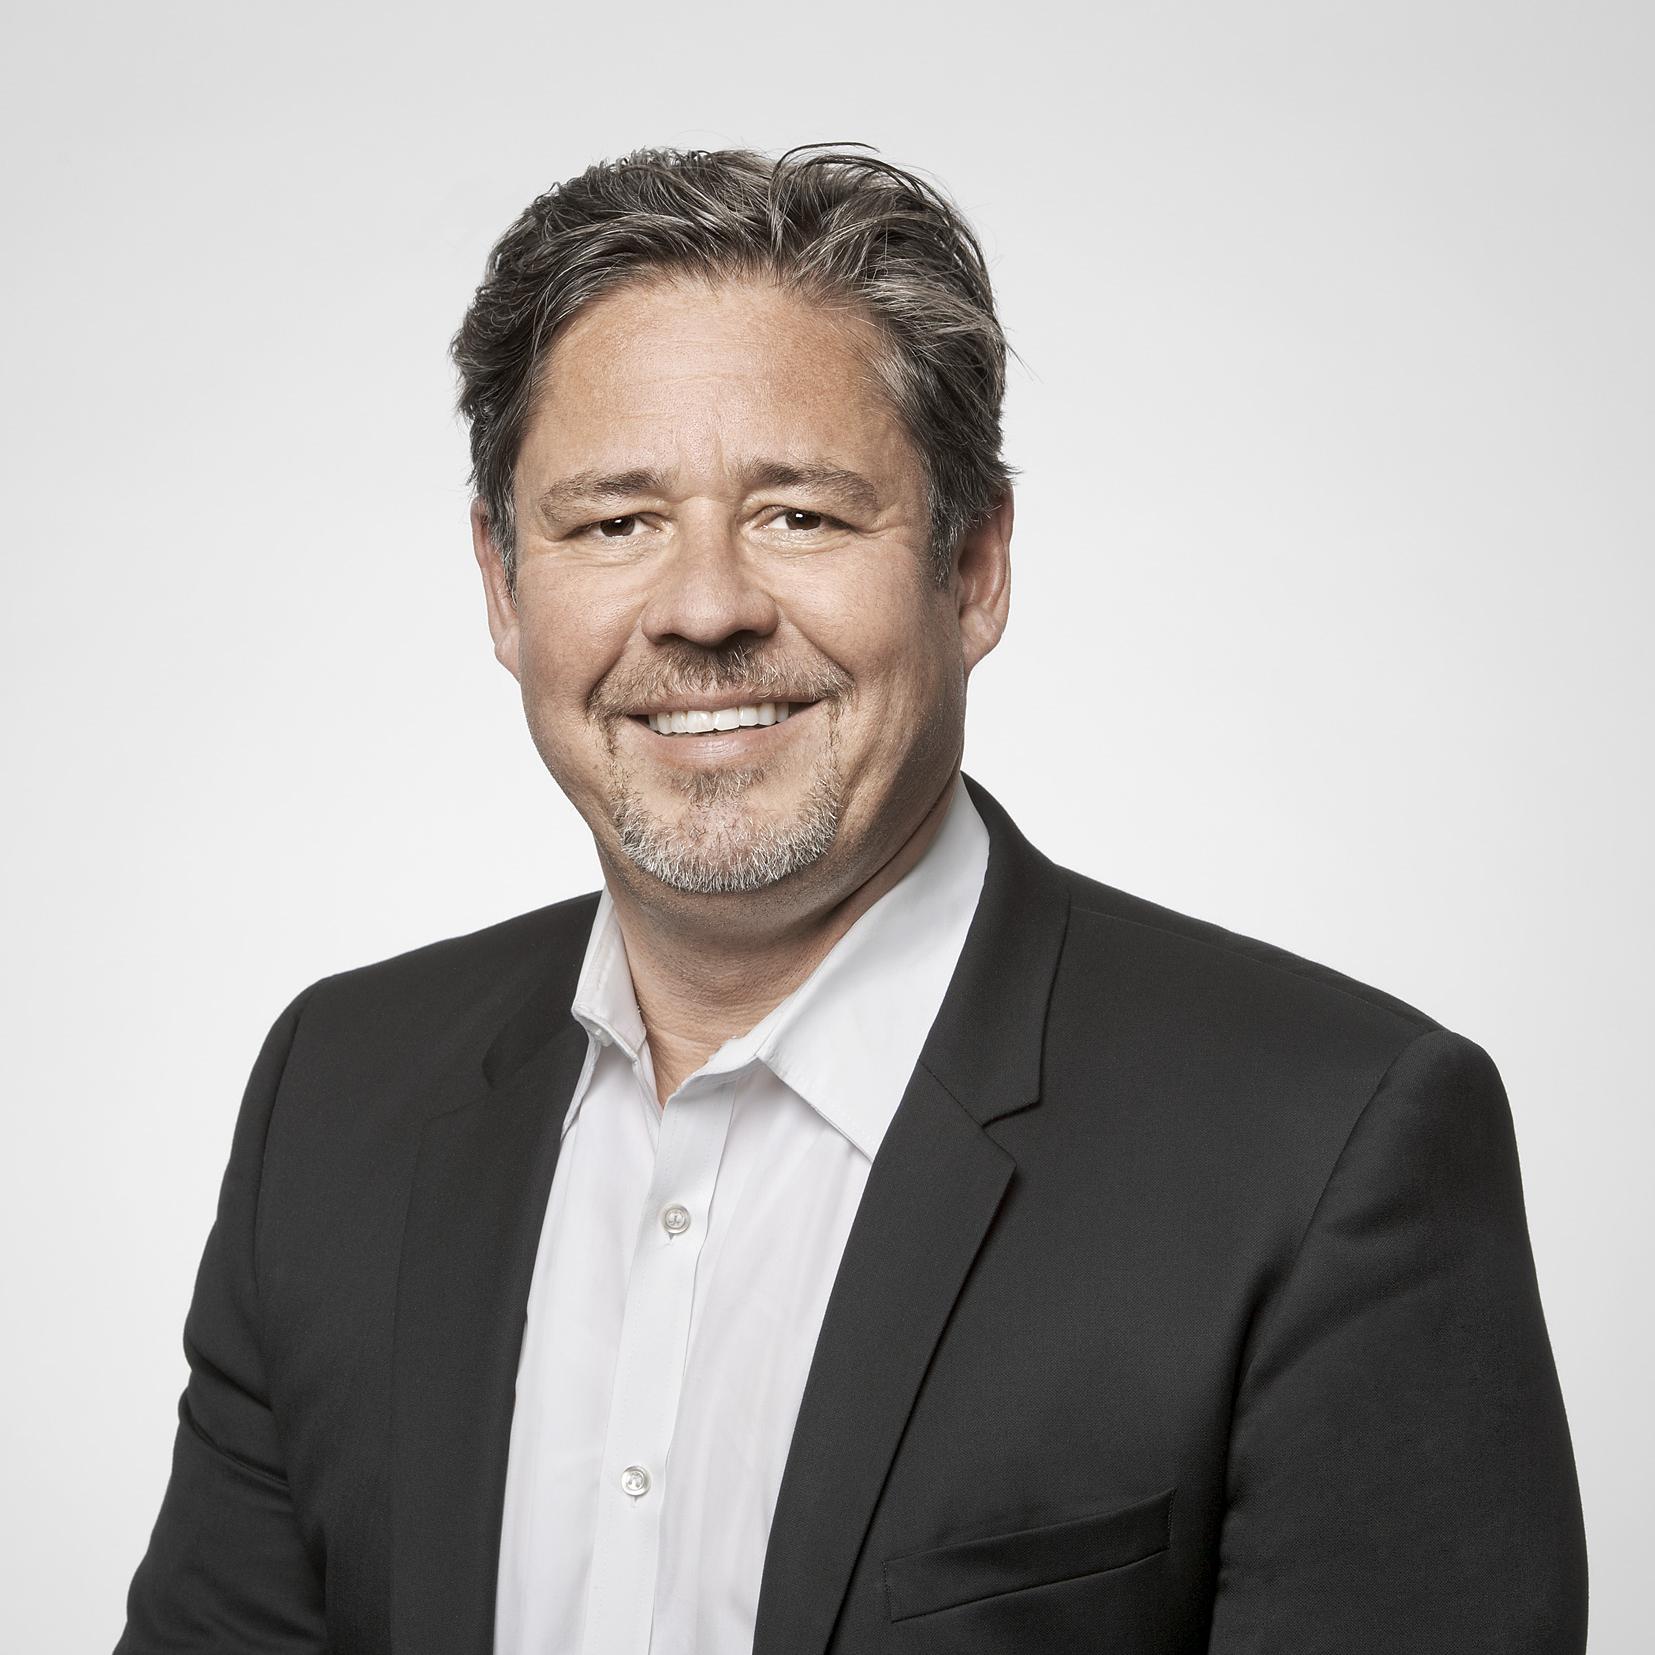 img-Daniel Schnüriger